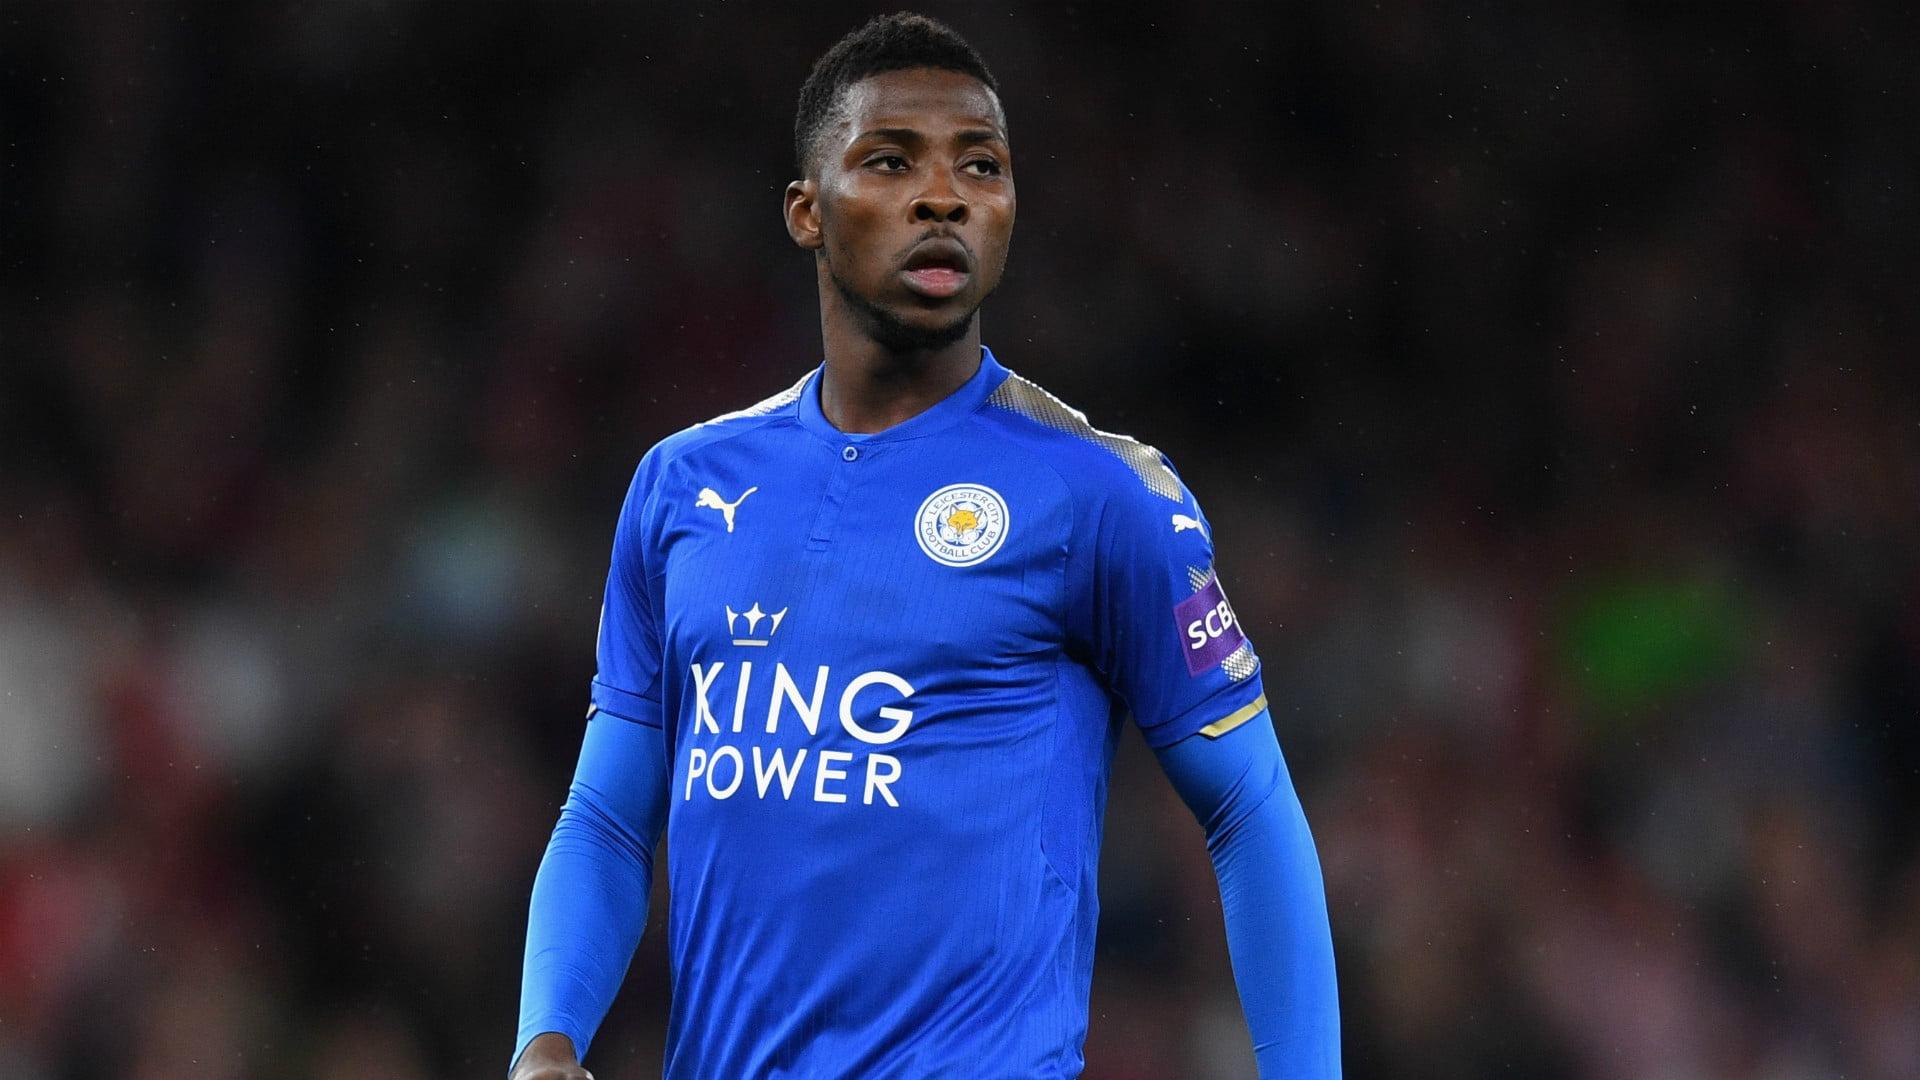 Iheanacho - Transfer: Iheanacho's future in doubt as Leicester sign £30m Premier League striker